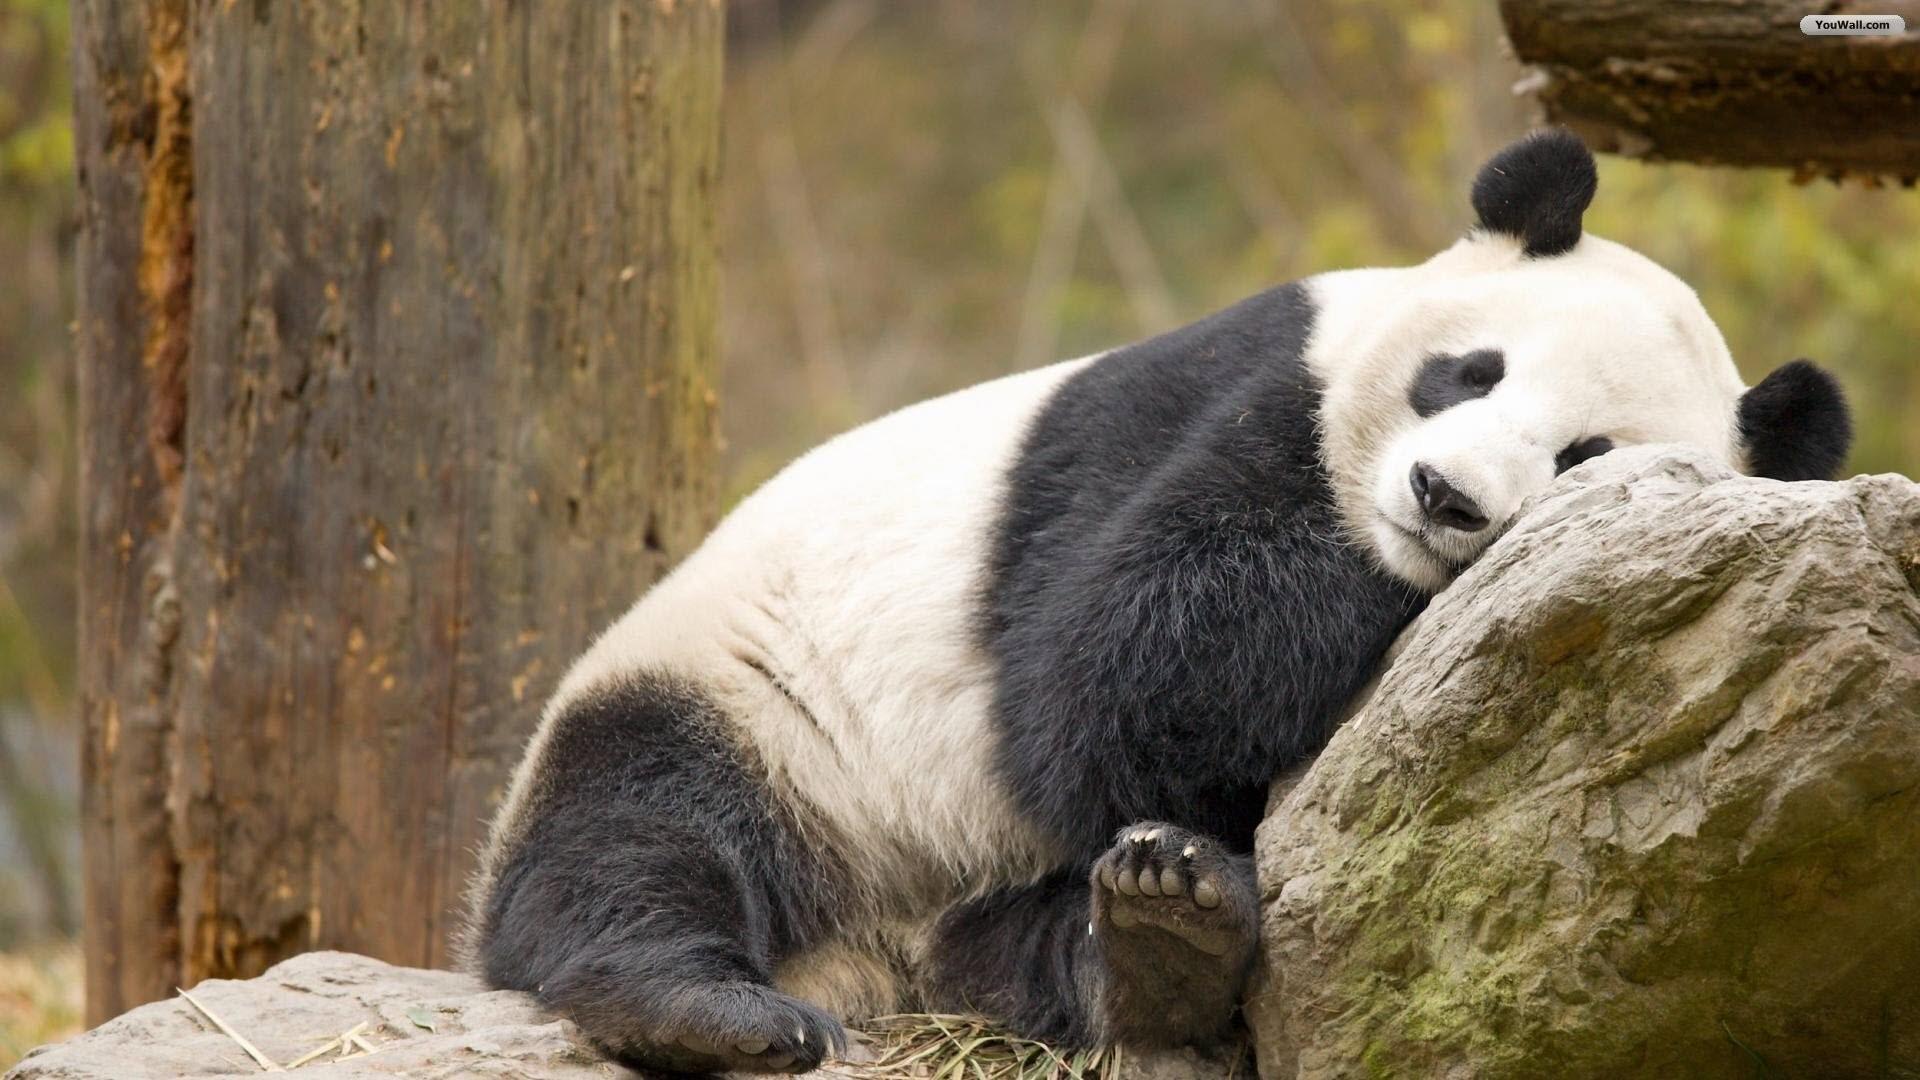 Panda Wallpaper 75 Pictures